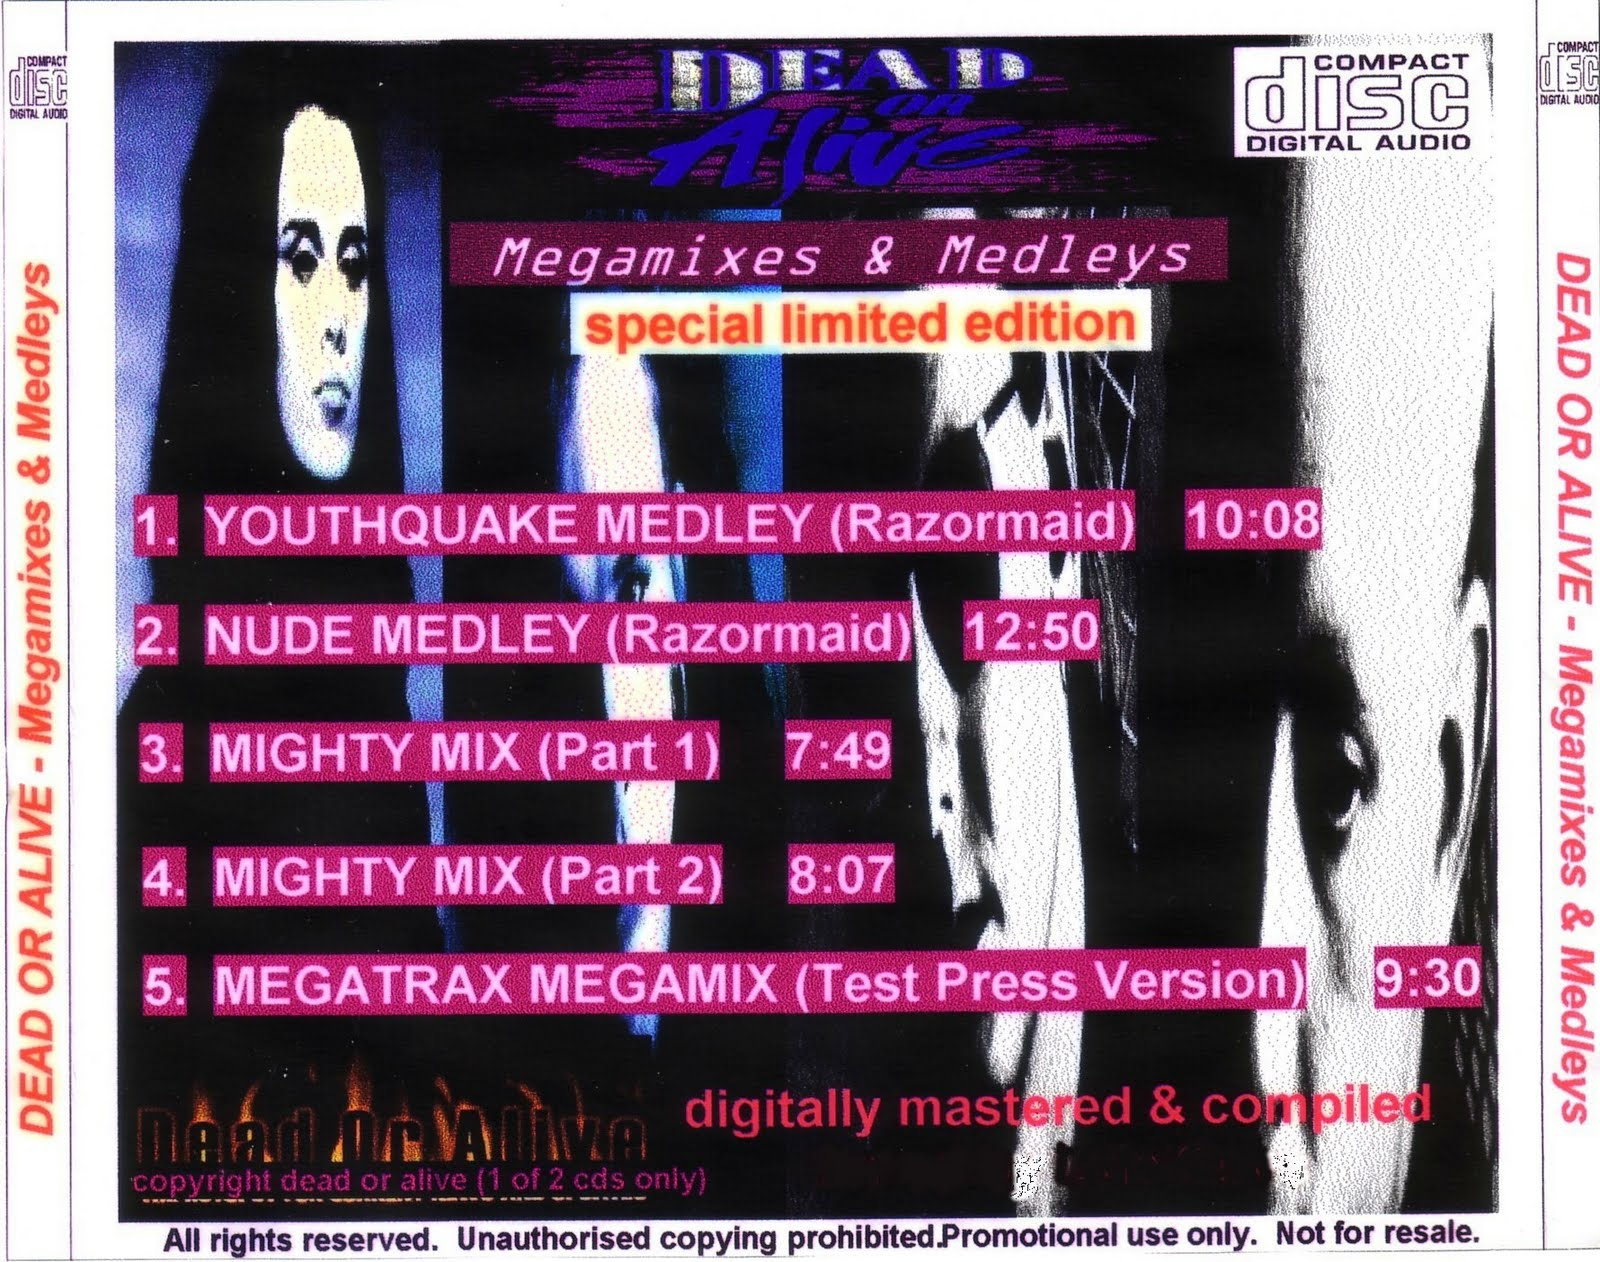 http://2.bp.blogspot.com/_rD5O5vyqk58/TE6w0376hxI/AAAAAAAABQw/rOq4scPvhZs/s1600/_03+DEAD+OR+ALIVE+-+Megamixes+%26+Medleys+(Album)+back+cover.jpg